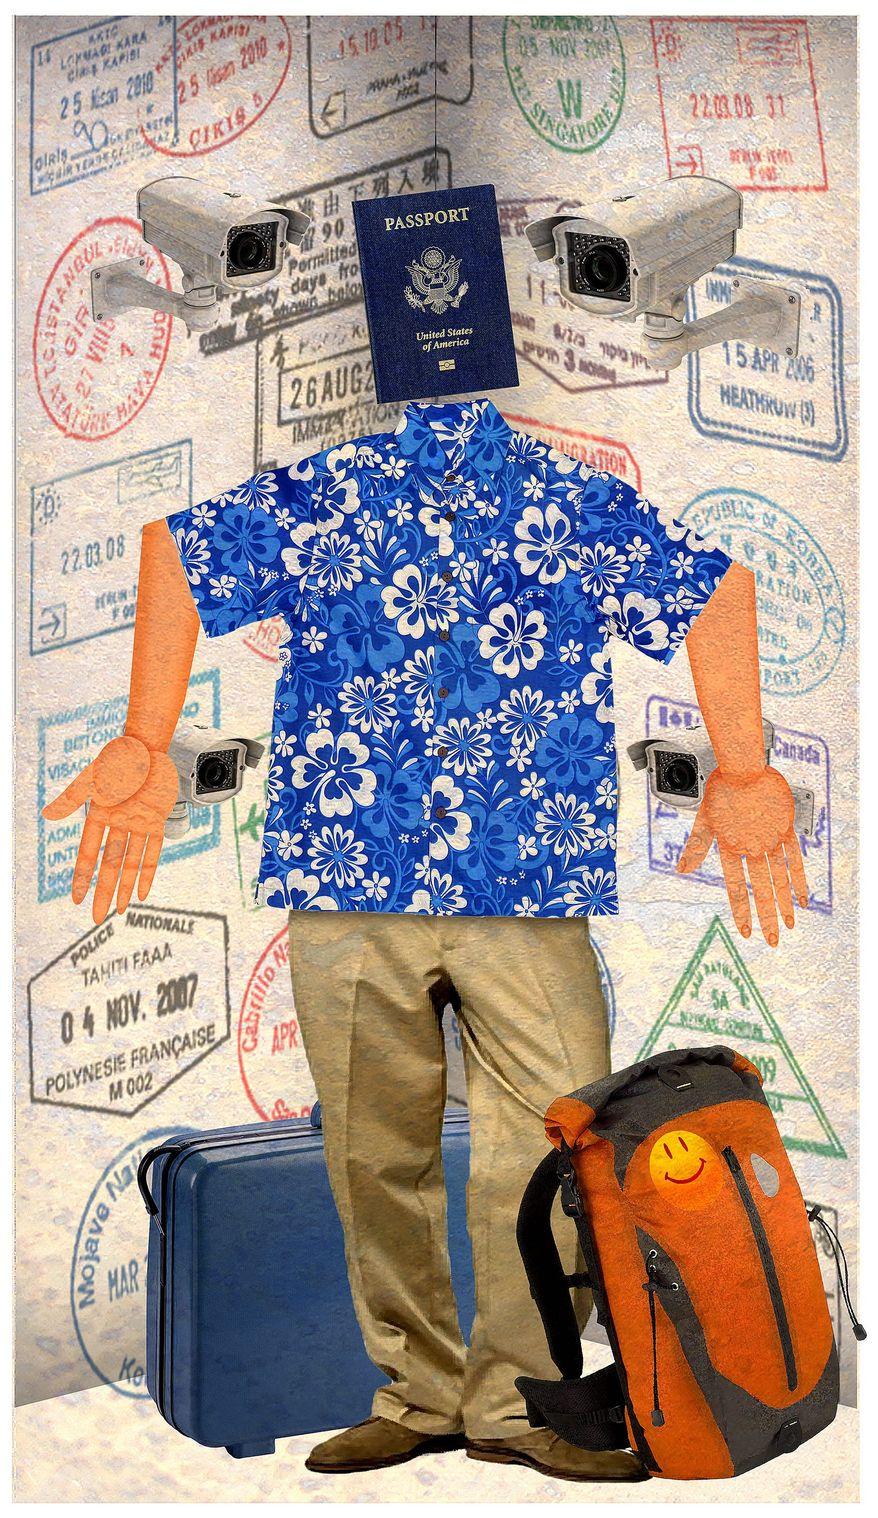 Illustration on tips for international travel by Alexander Hunter/The Washington Times